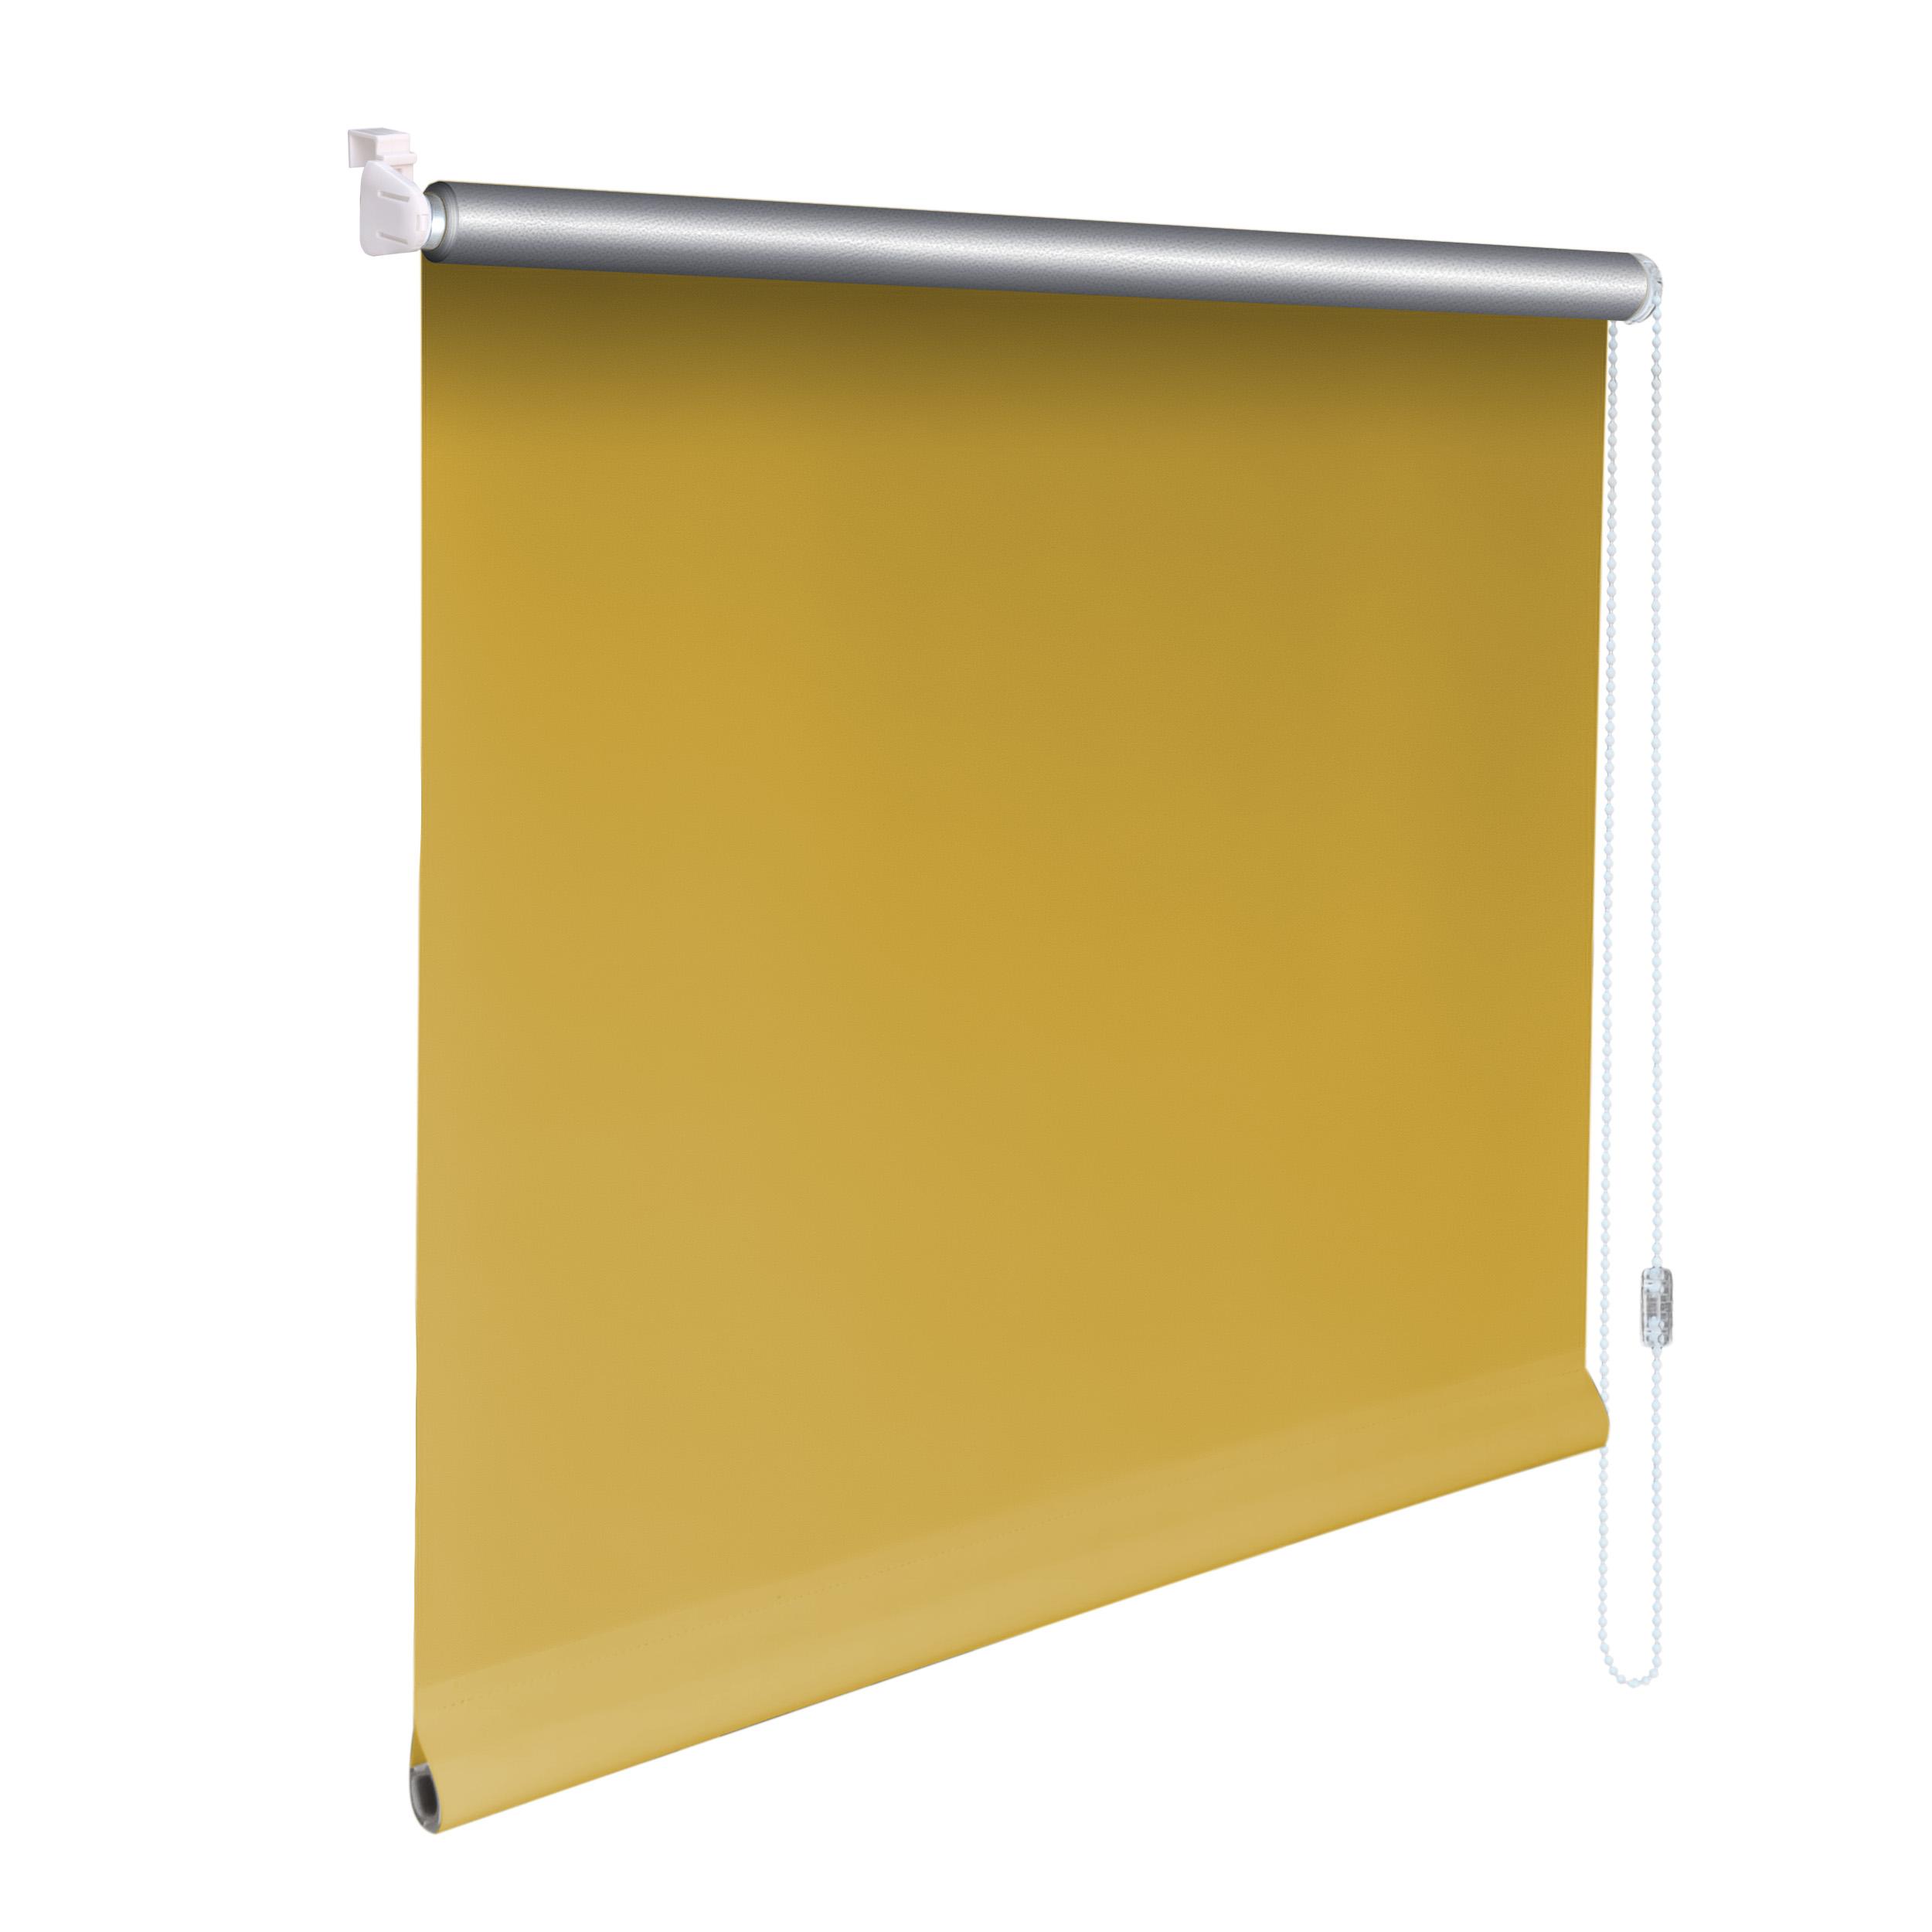 Höhe 90 cm gelb Mini-Rollo Klemmfix ALU THERMO Klemmrollo Verdunkelung